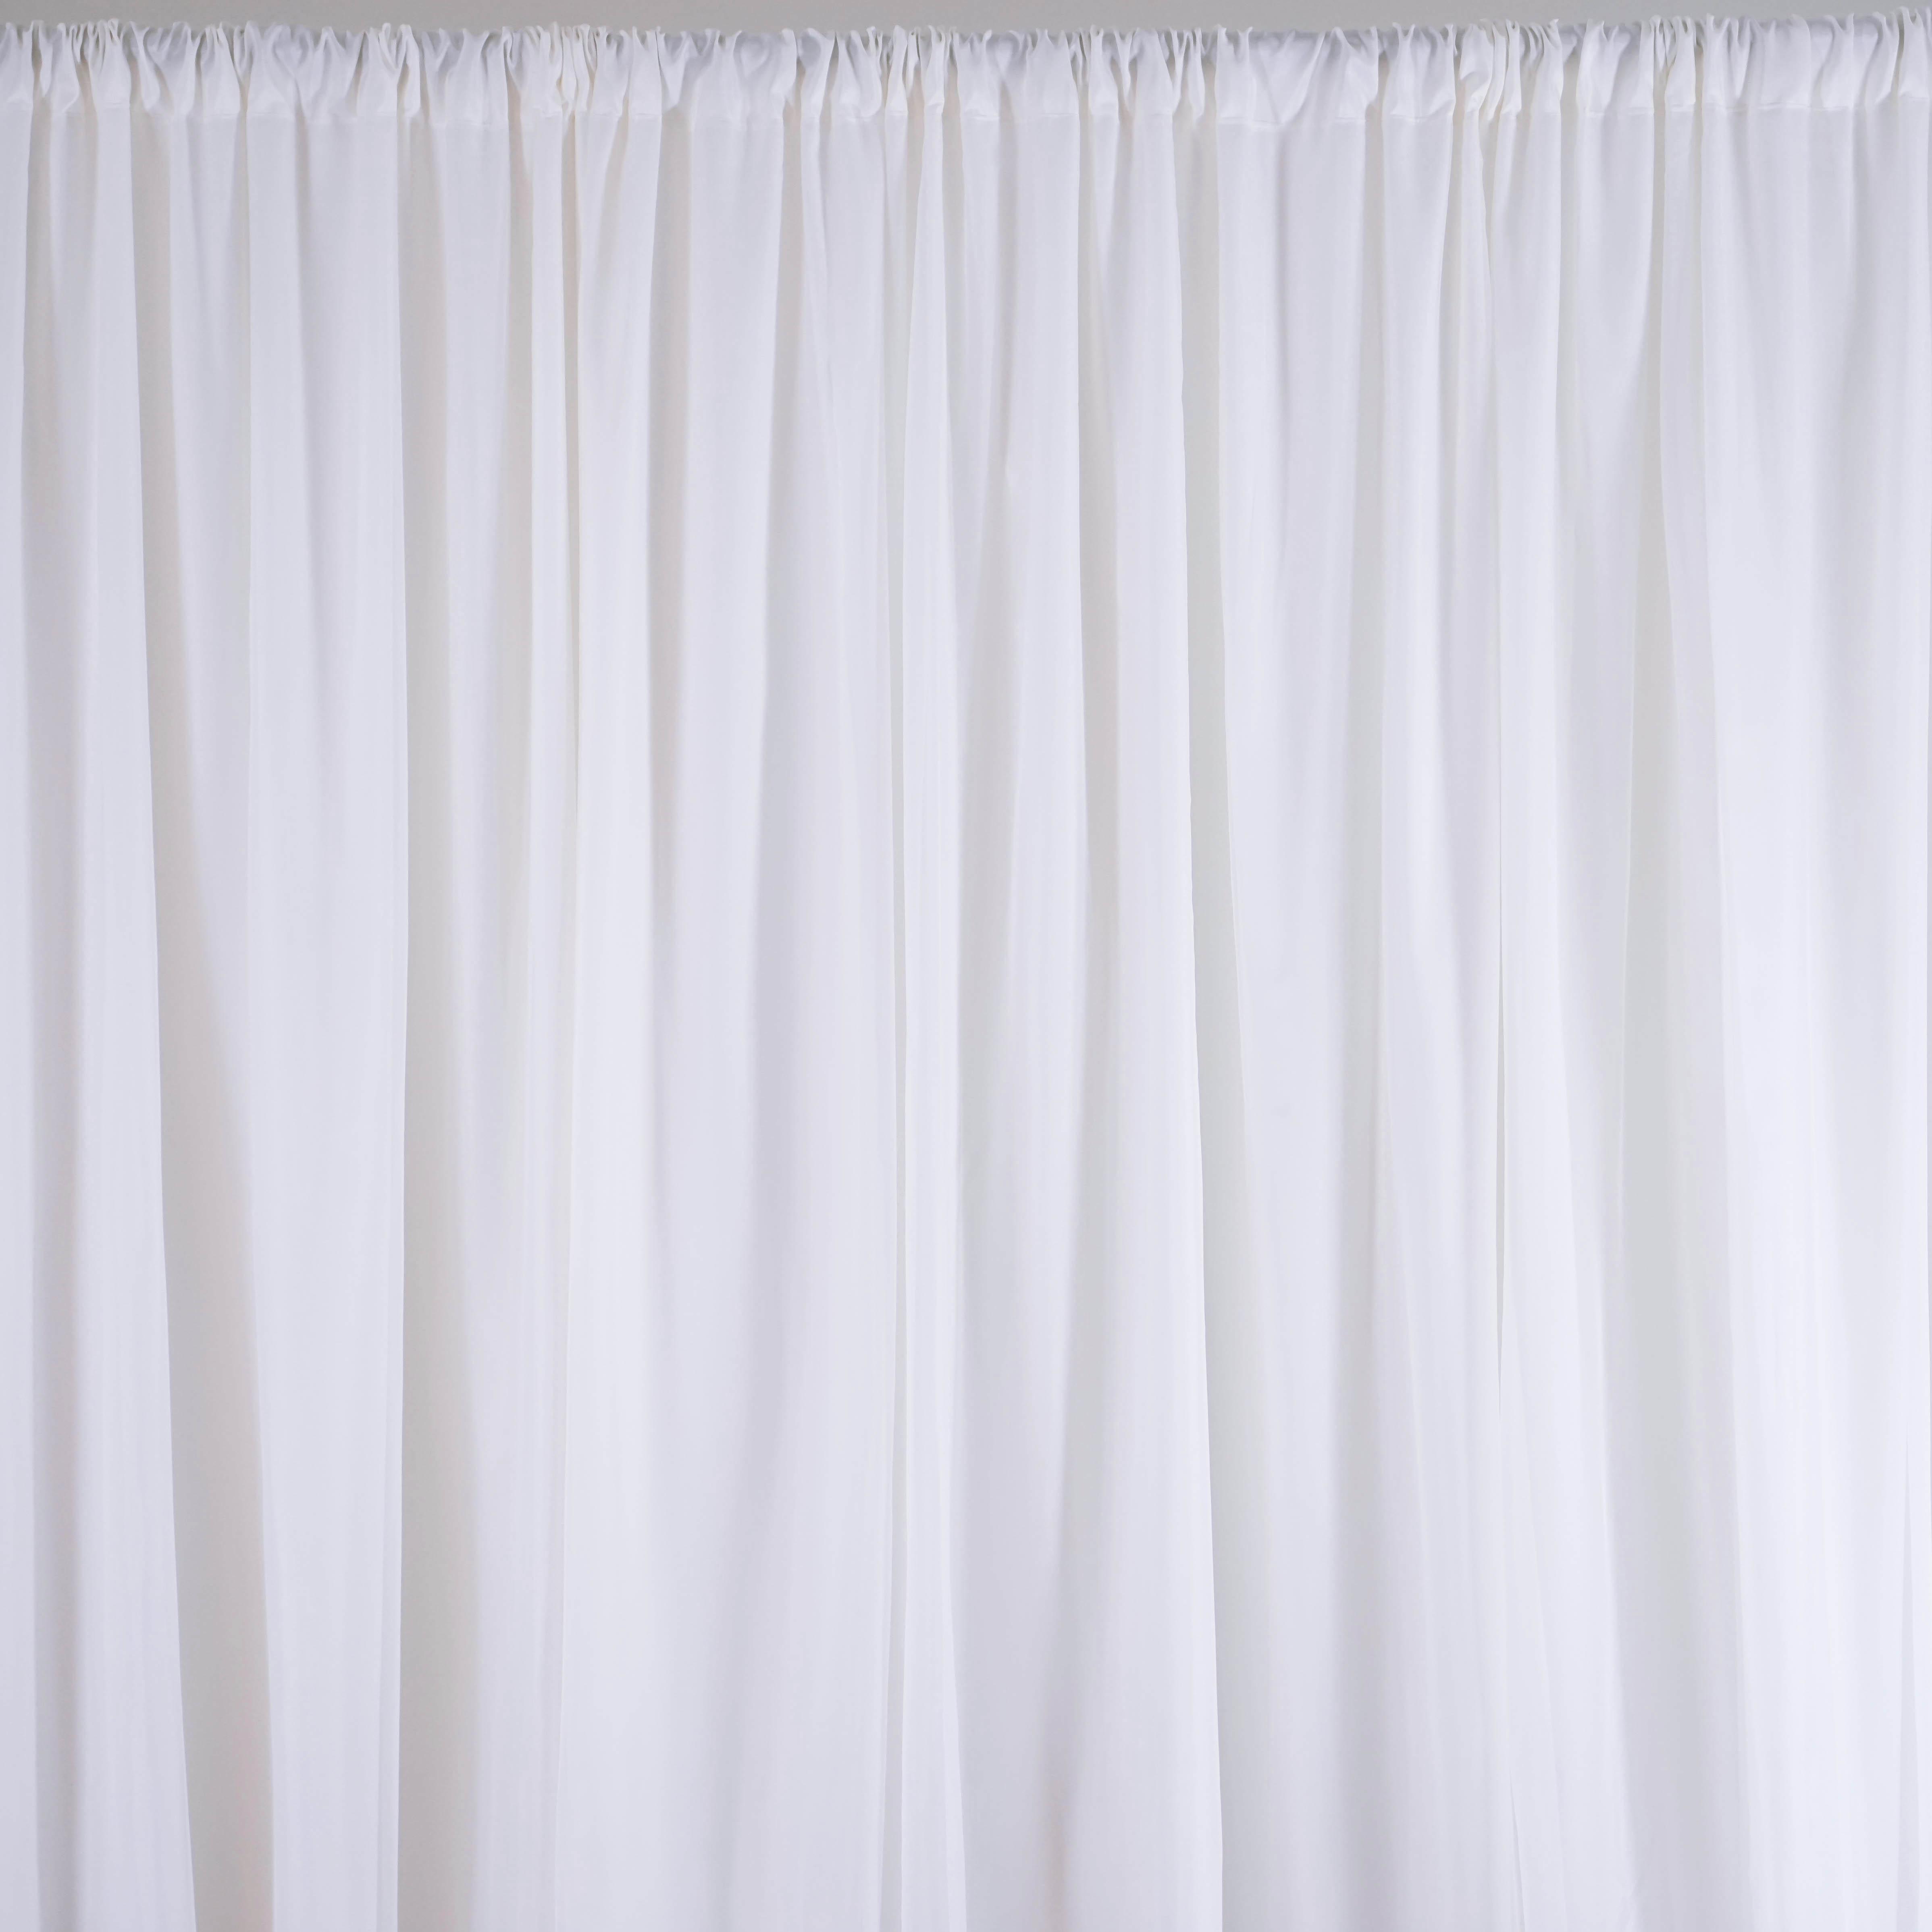 polyester chair sashes wholesale pilates on exercises 20ft x 8ft white professional backdrop photo background wedding decorations | ebay